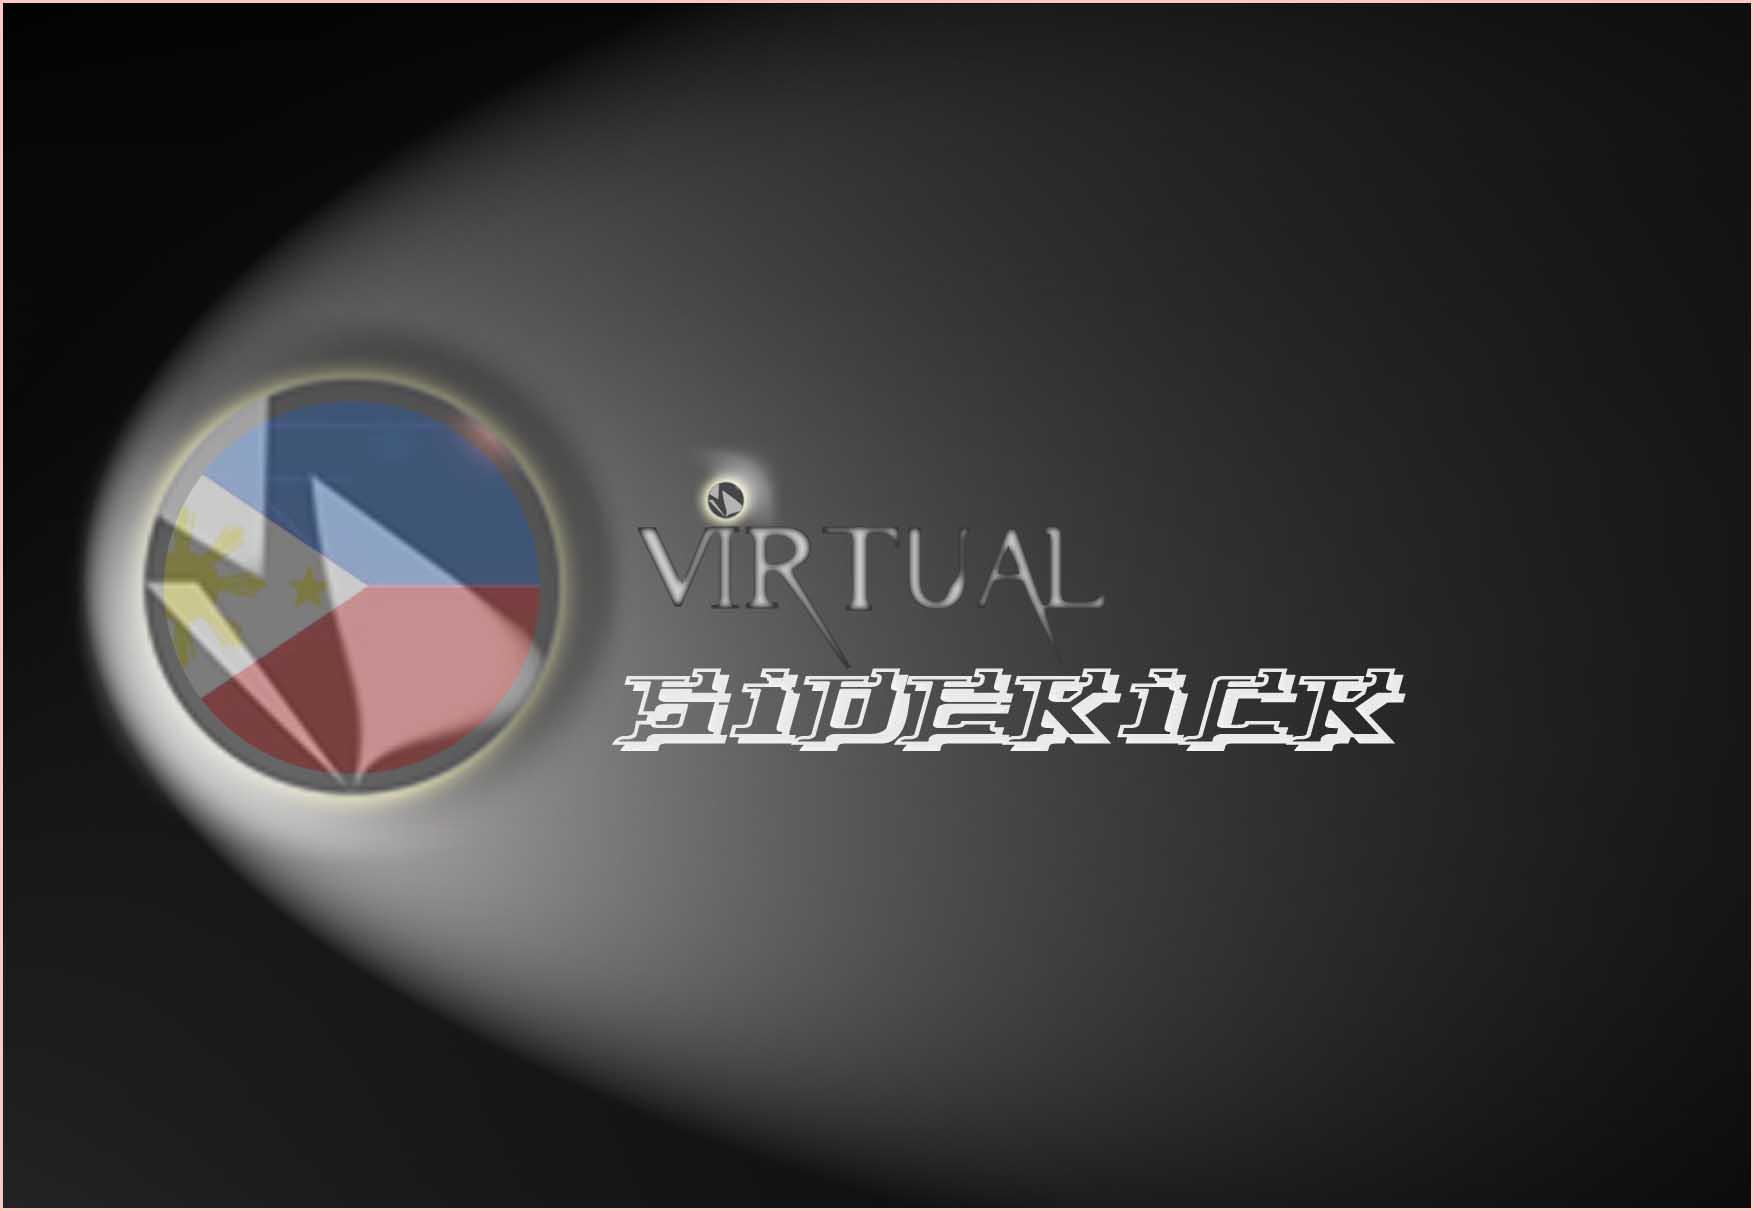 Logo Design by faza-bejo - Entry No. 113 in the Logo Design Contest Fun Logo Design for Virtual Sidekick.